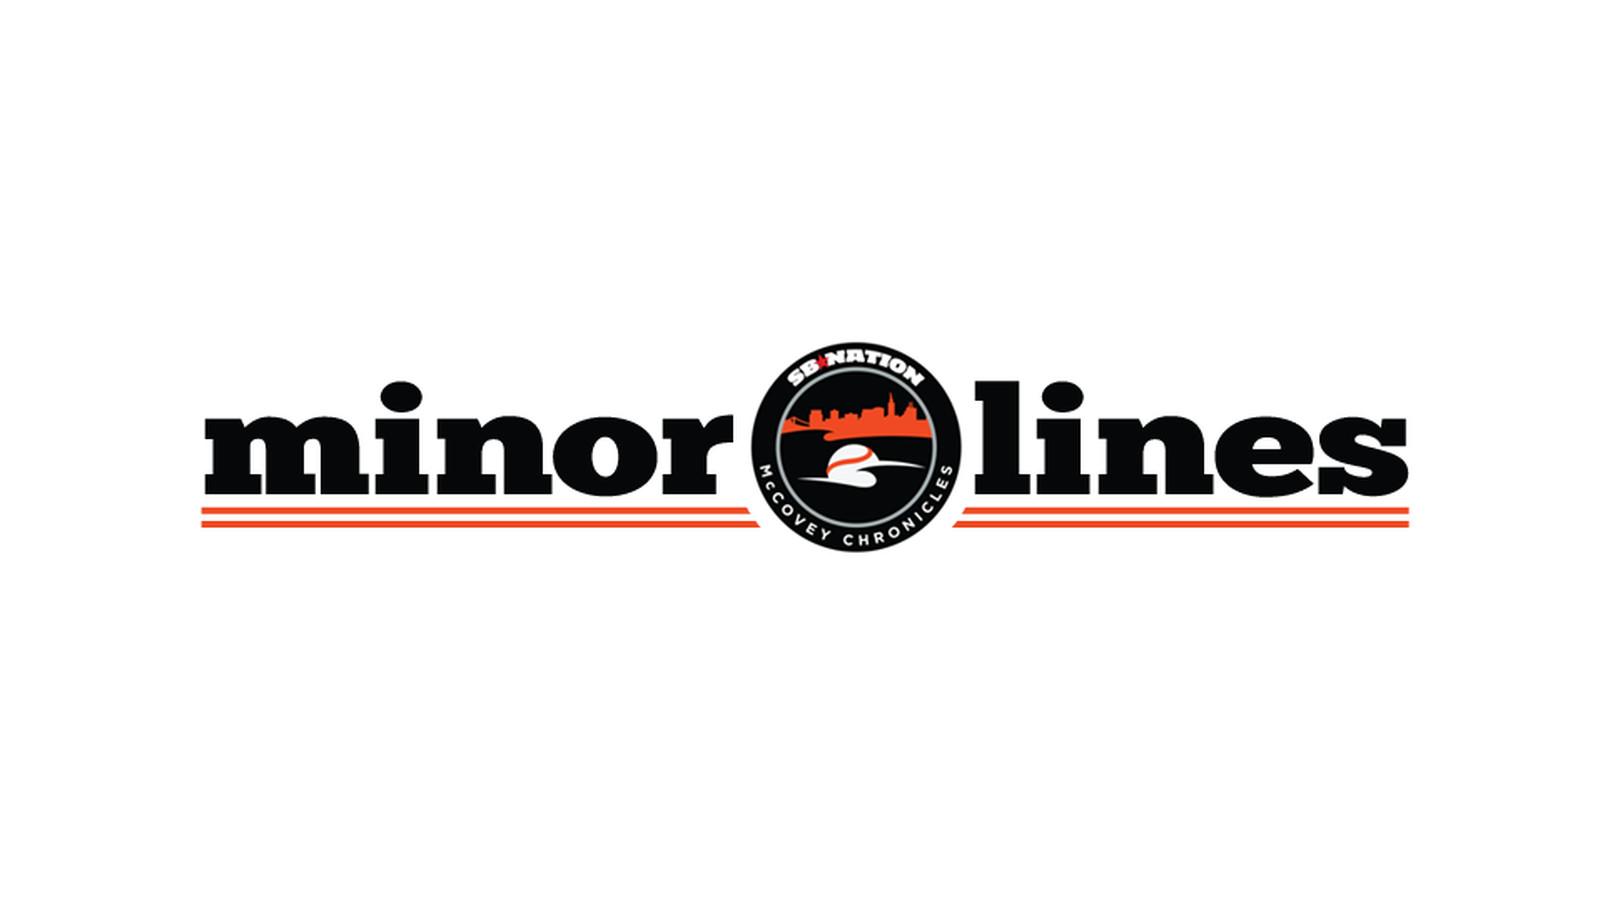 Mcc-minor-lines.0